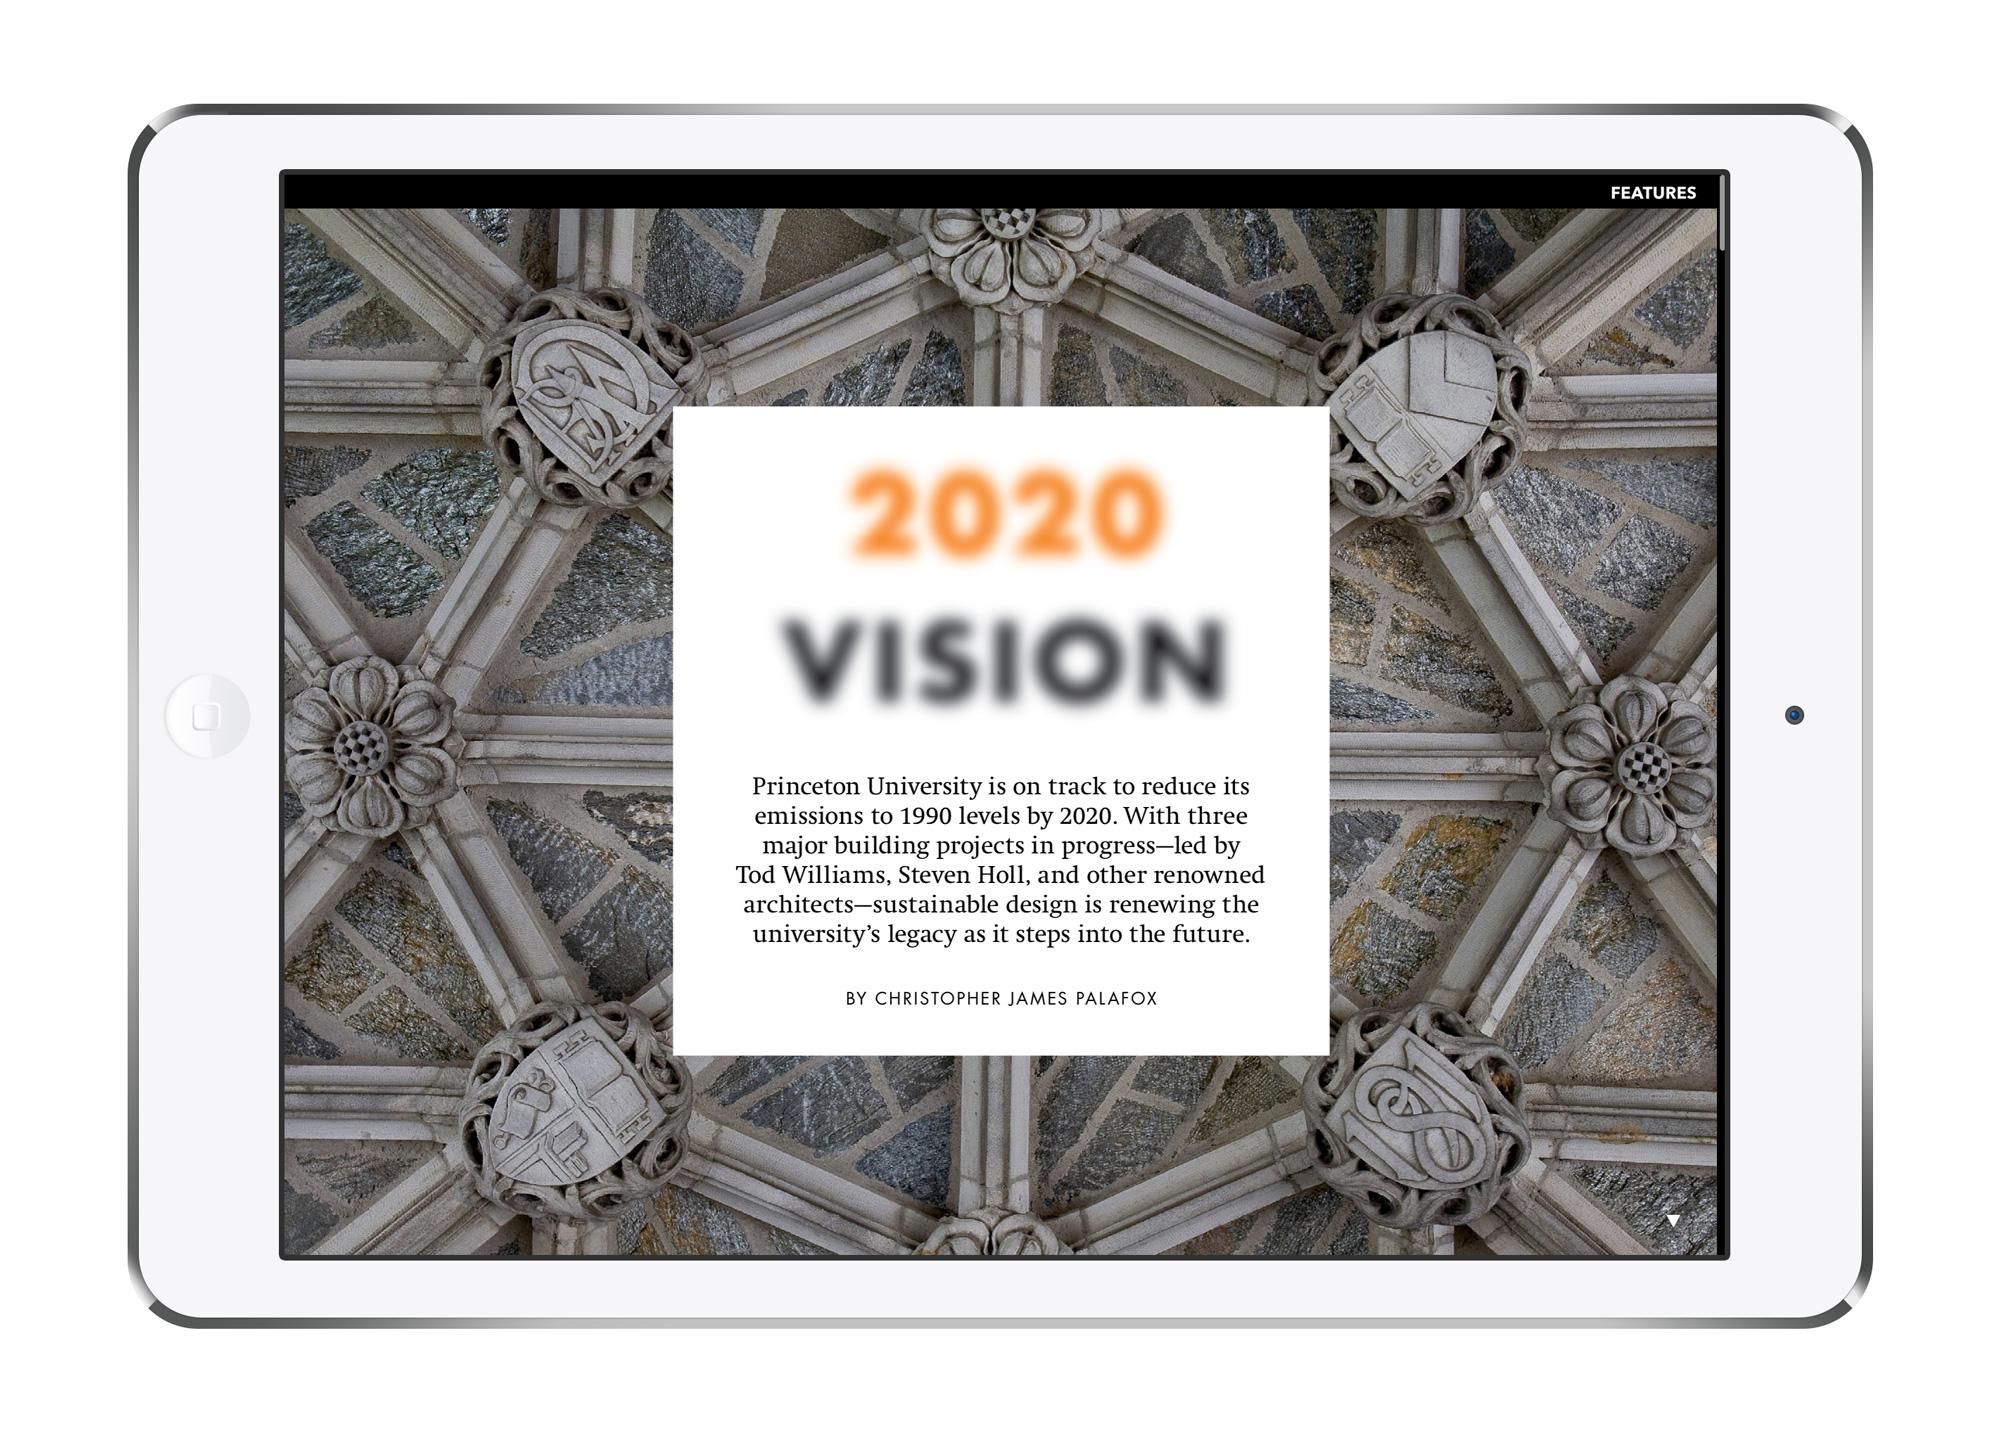 GBD_iPad_Feature-Princeton.jpg